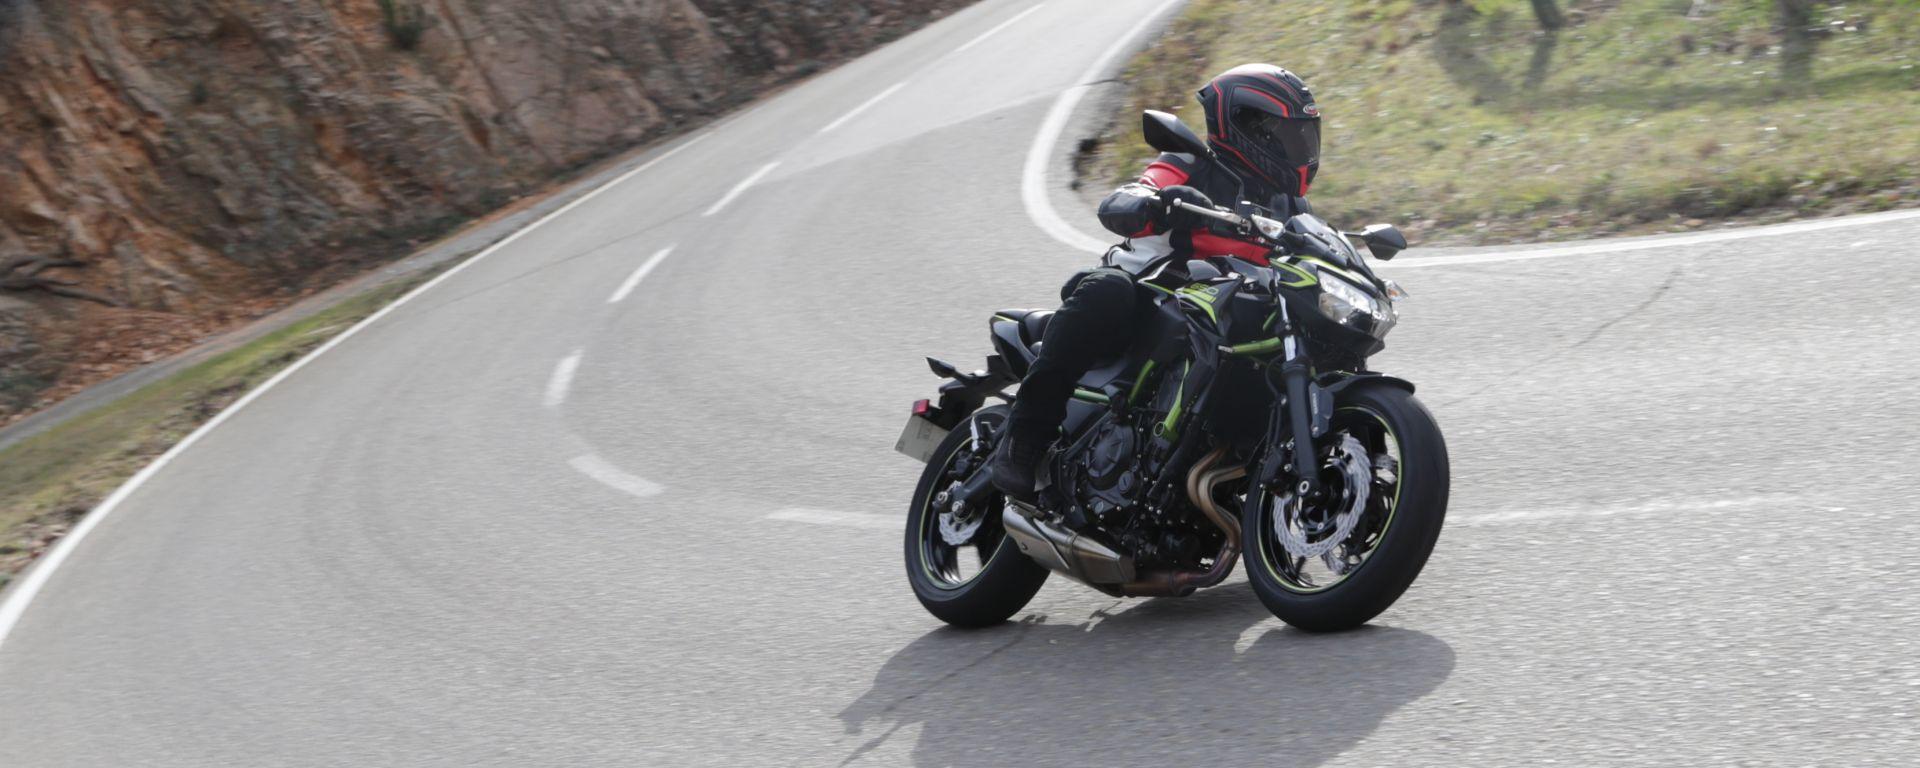 Kawasaki Z 650 2020: la prova su strada